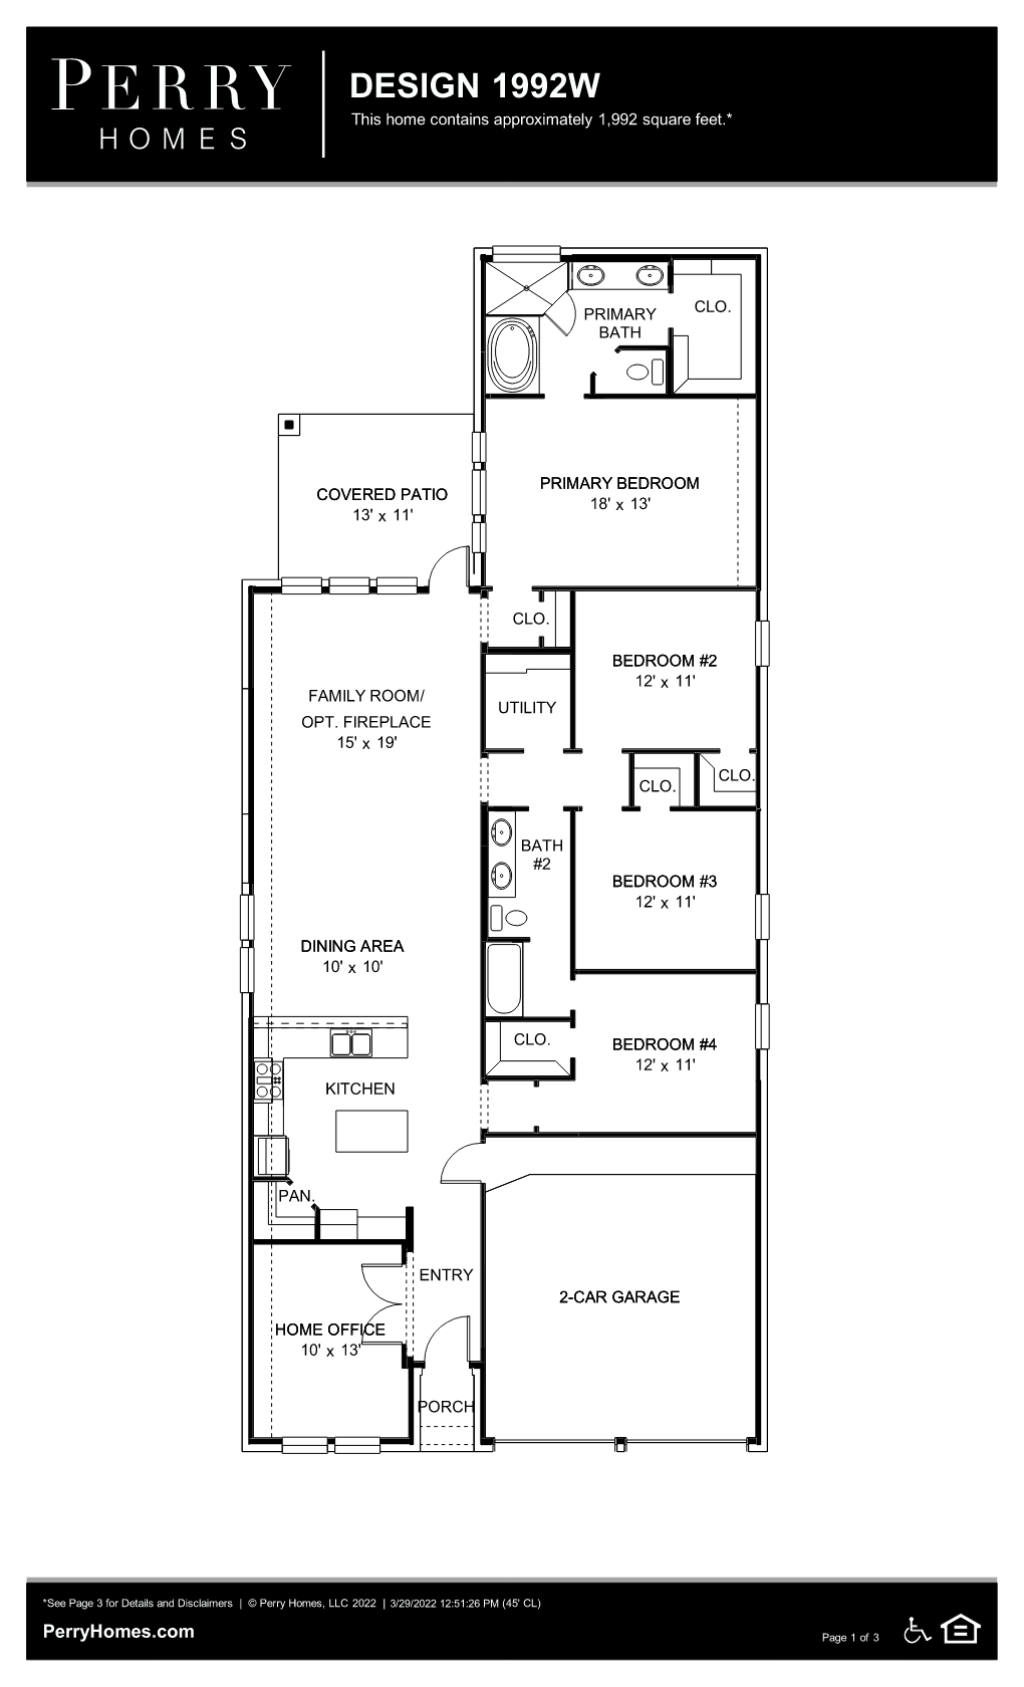 Floor Plan for 1992W